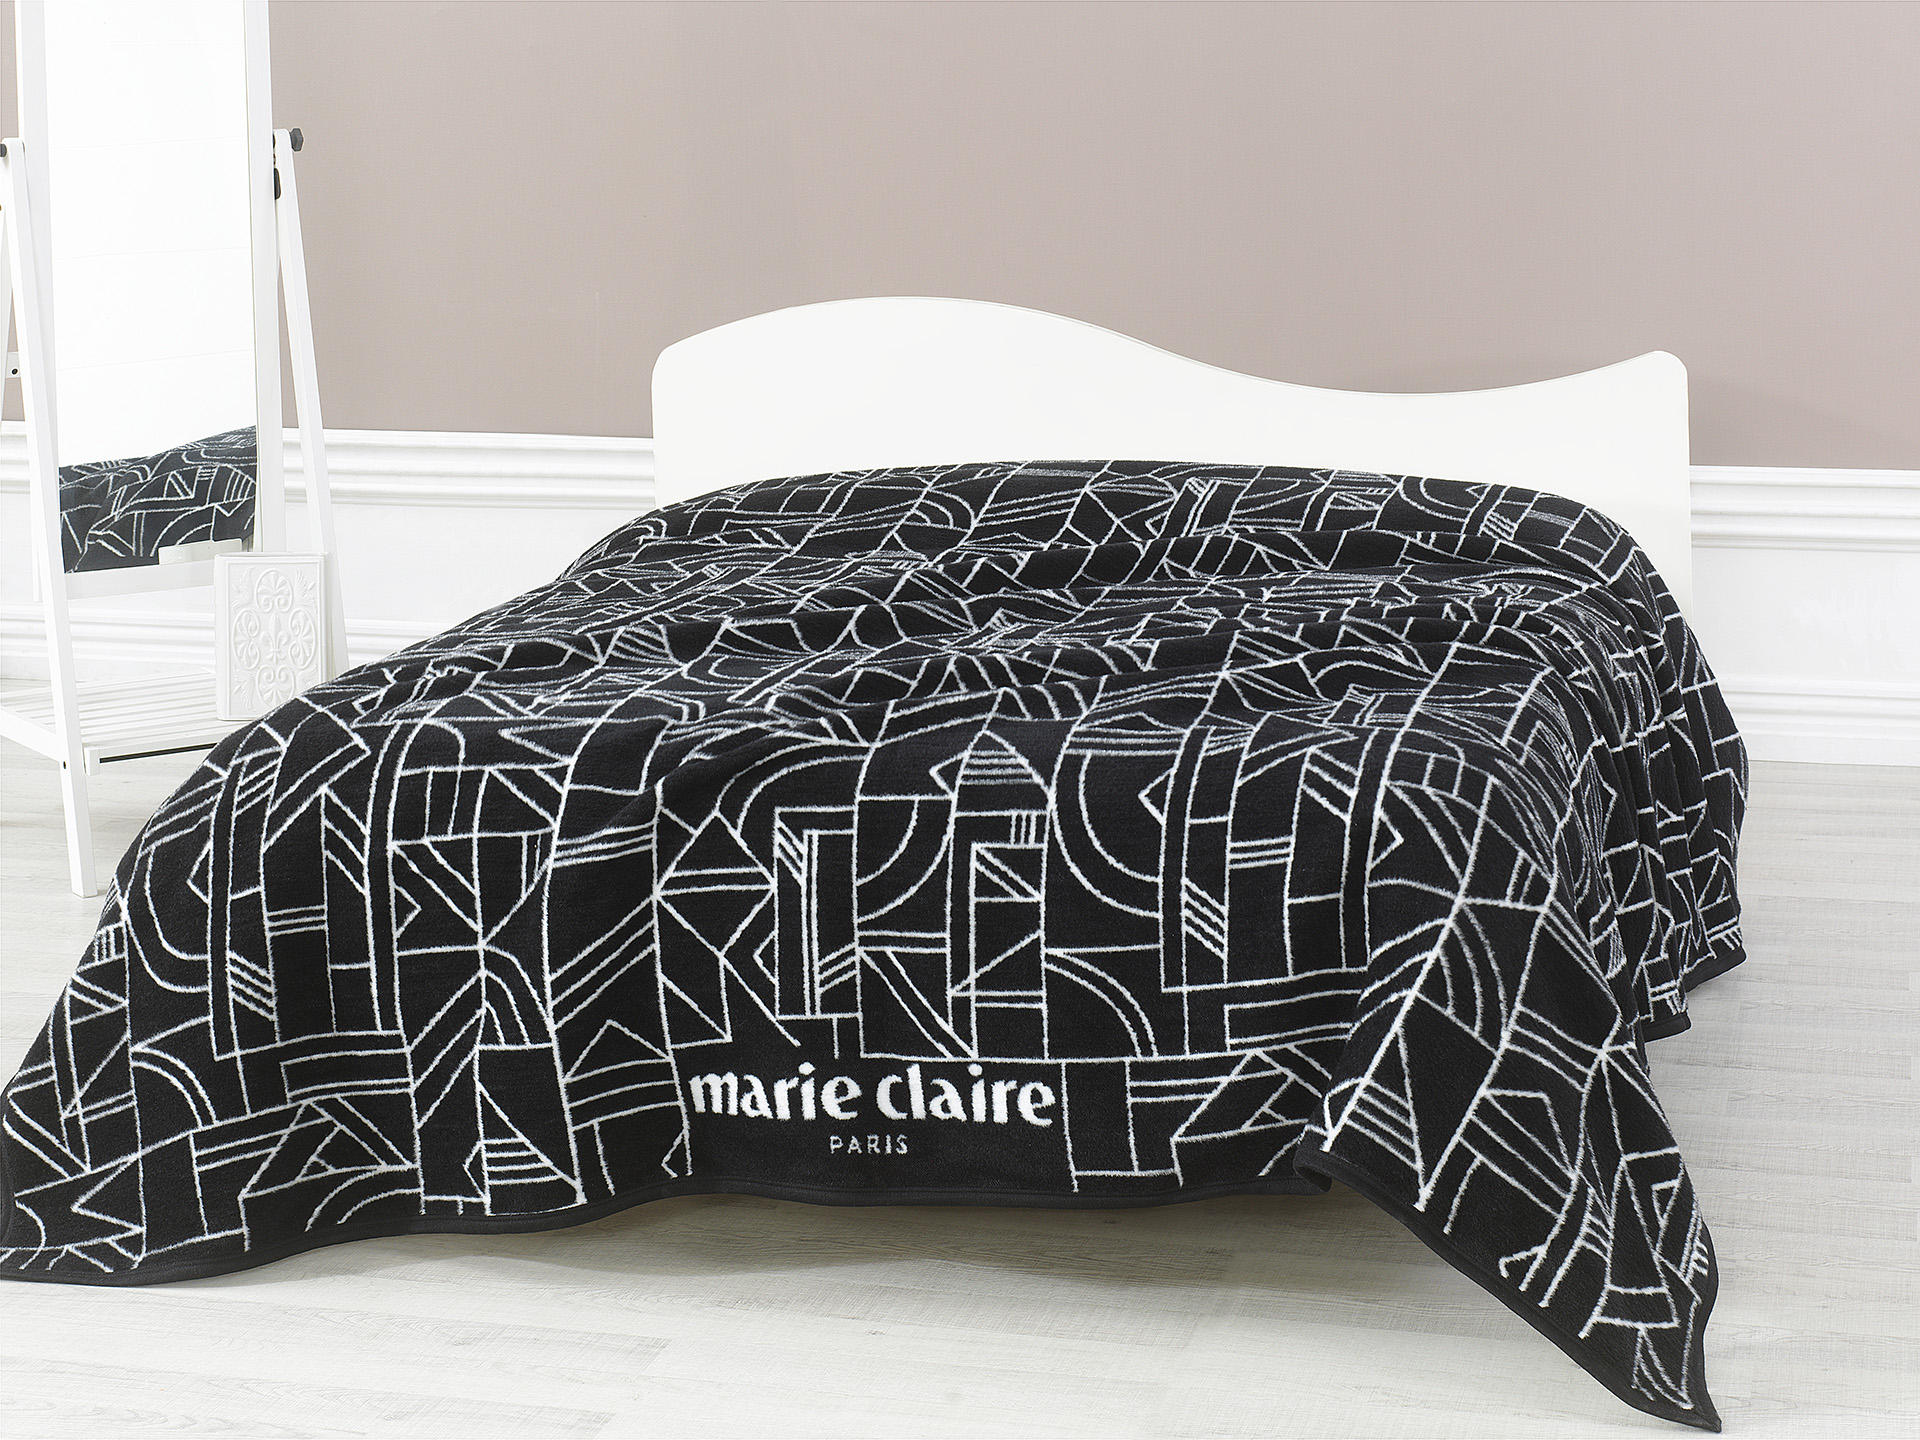 marie claire art deco. Black Bedroom Furniture Sets. Home Design Ideas